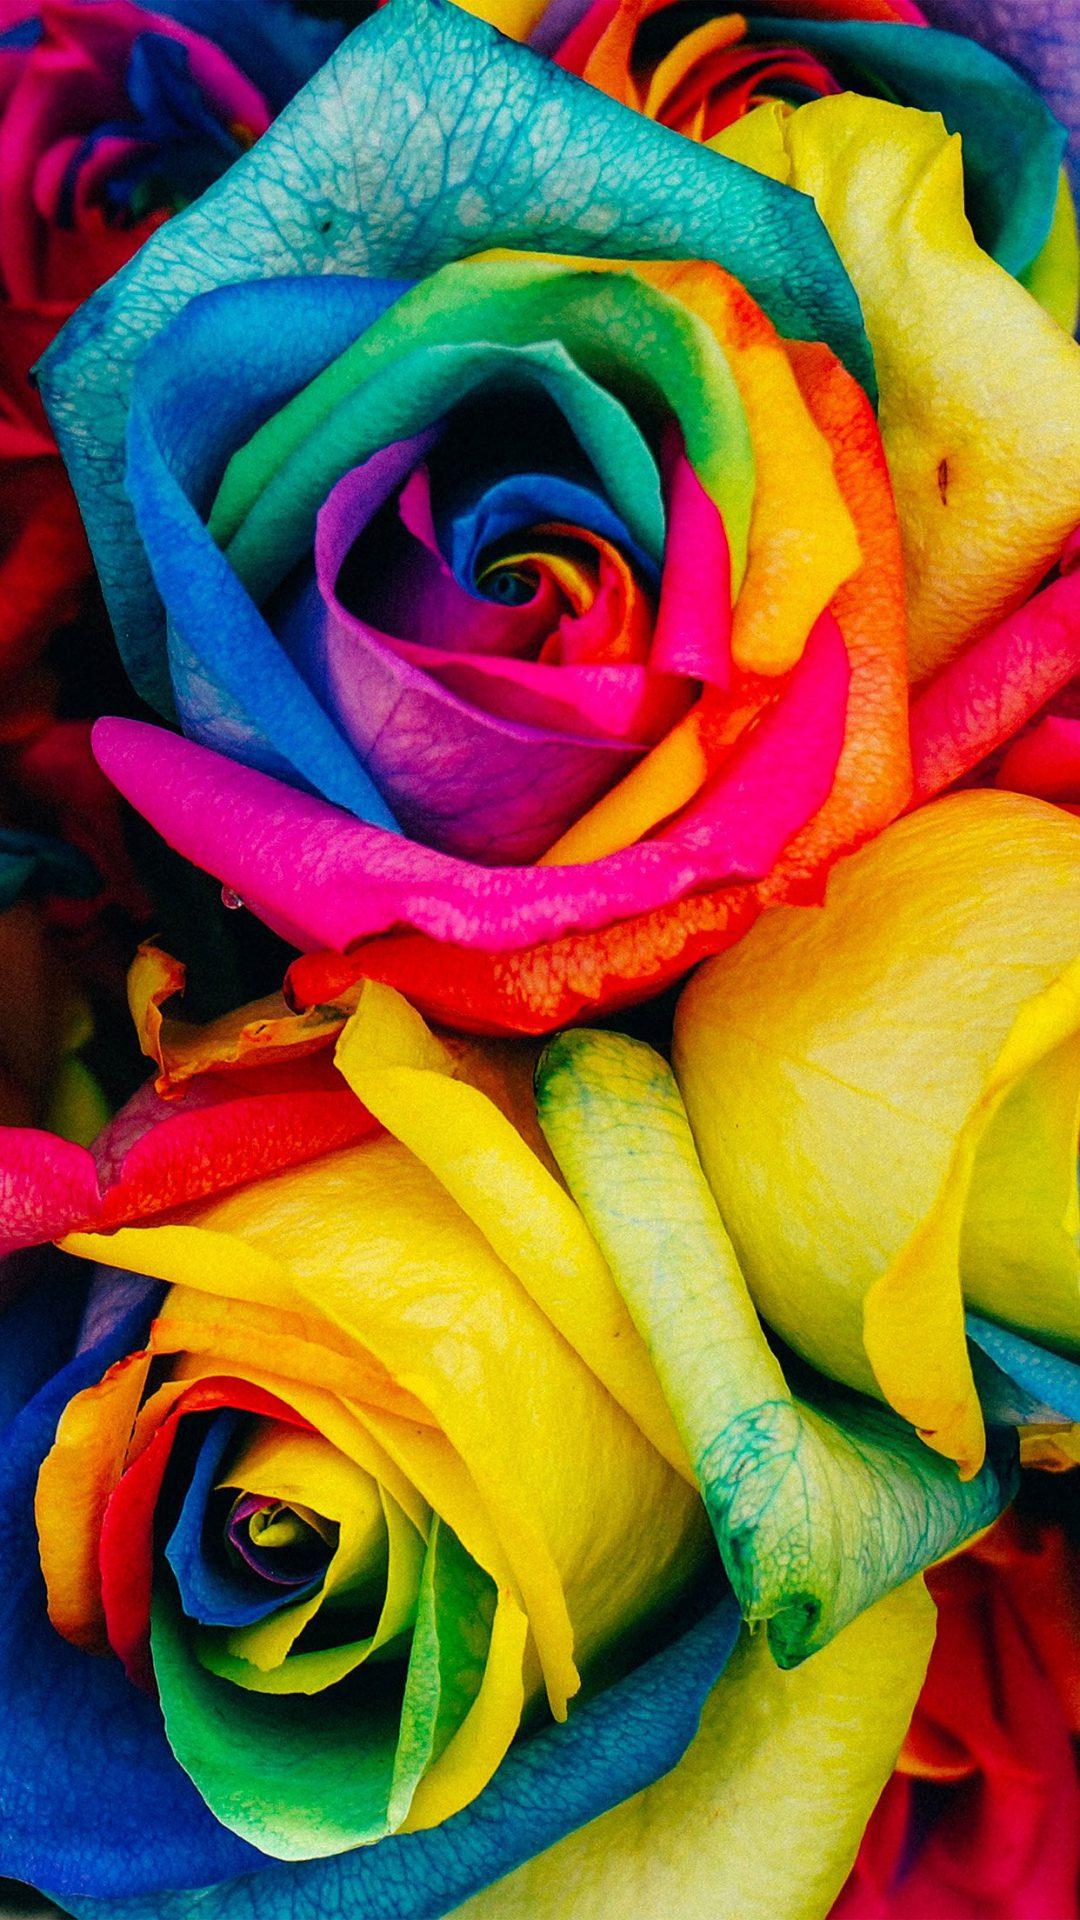 Flower Rose Color Rainbow Art Nature